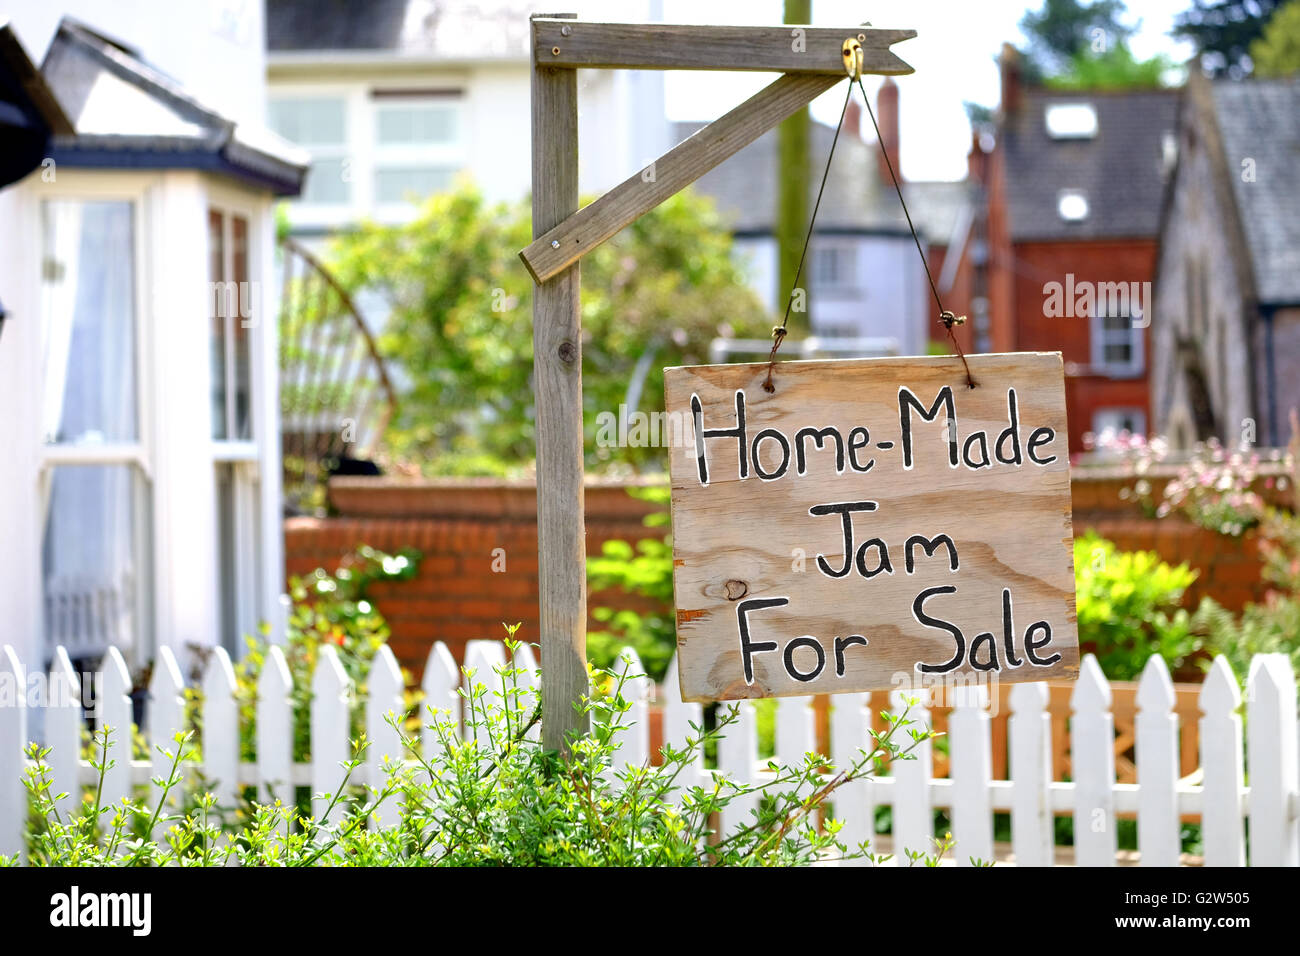 Home-made jam for sale in Lympstone, Devon, UK - Stock Image